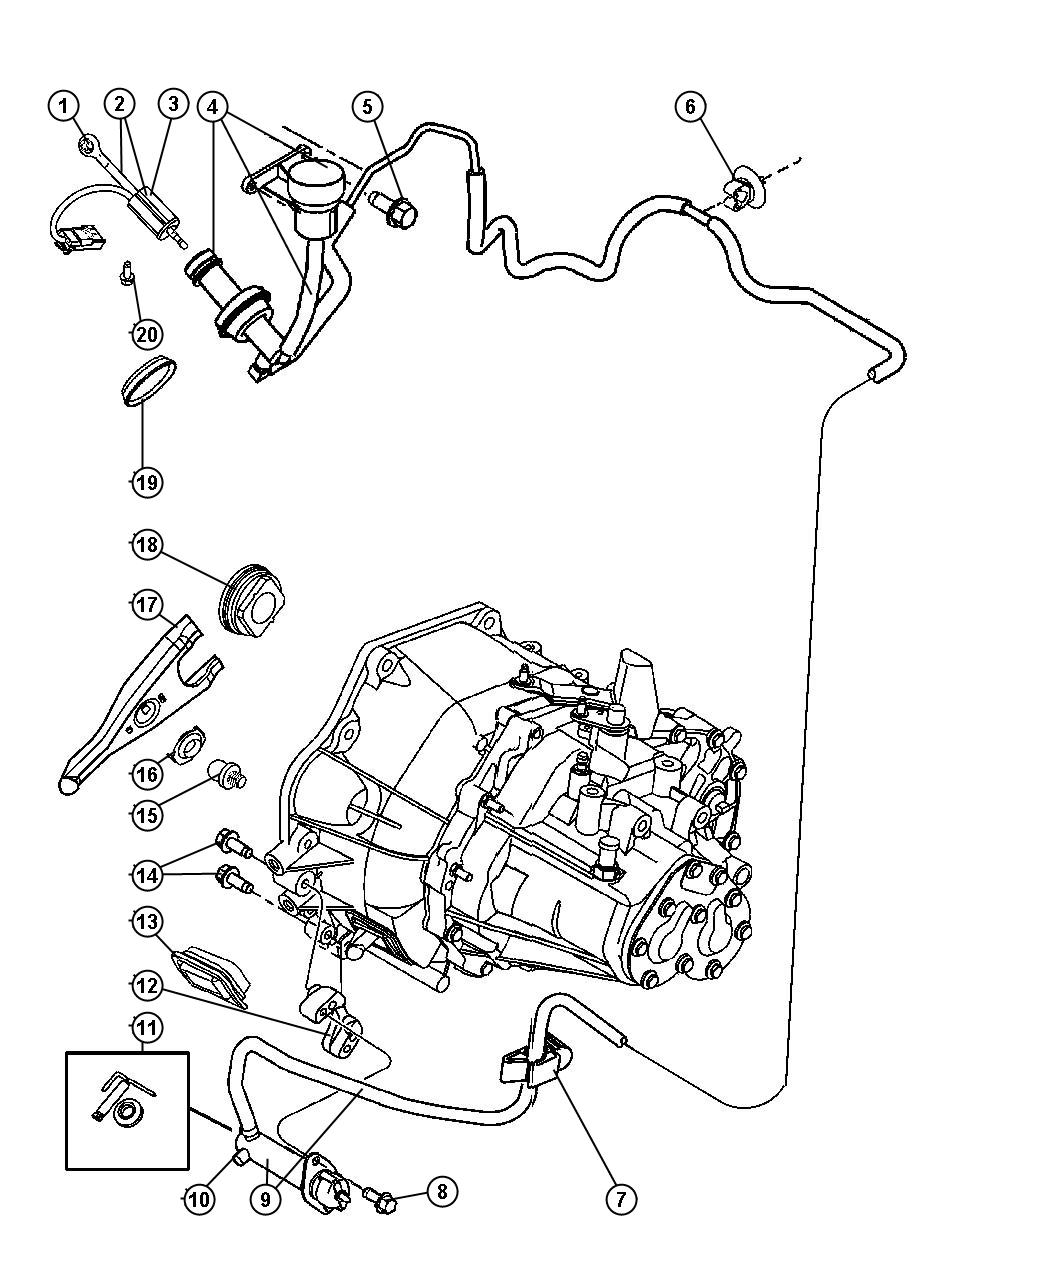 00i99512?resize=665%2C808 2005 dodge neon wiring diagram wiring diagram,05 Dodge Neon Fuse Box Diagram